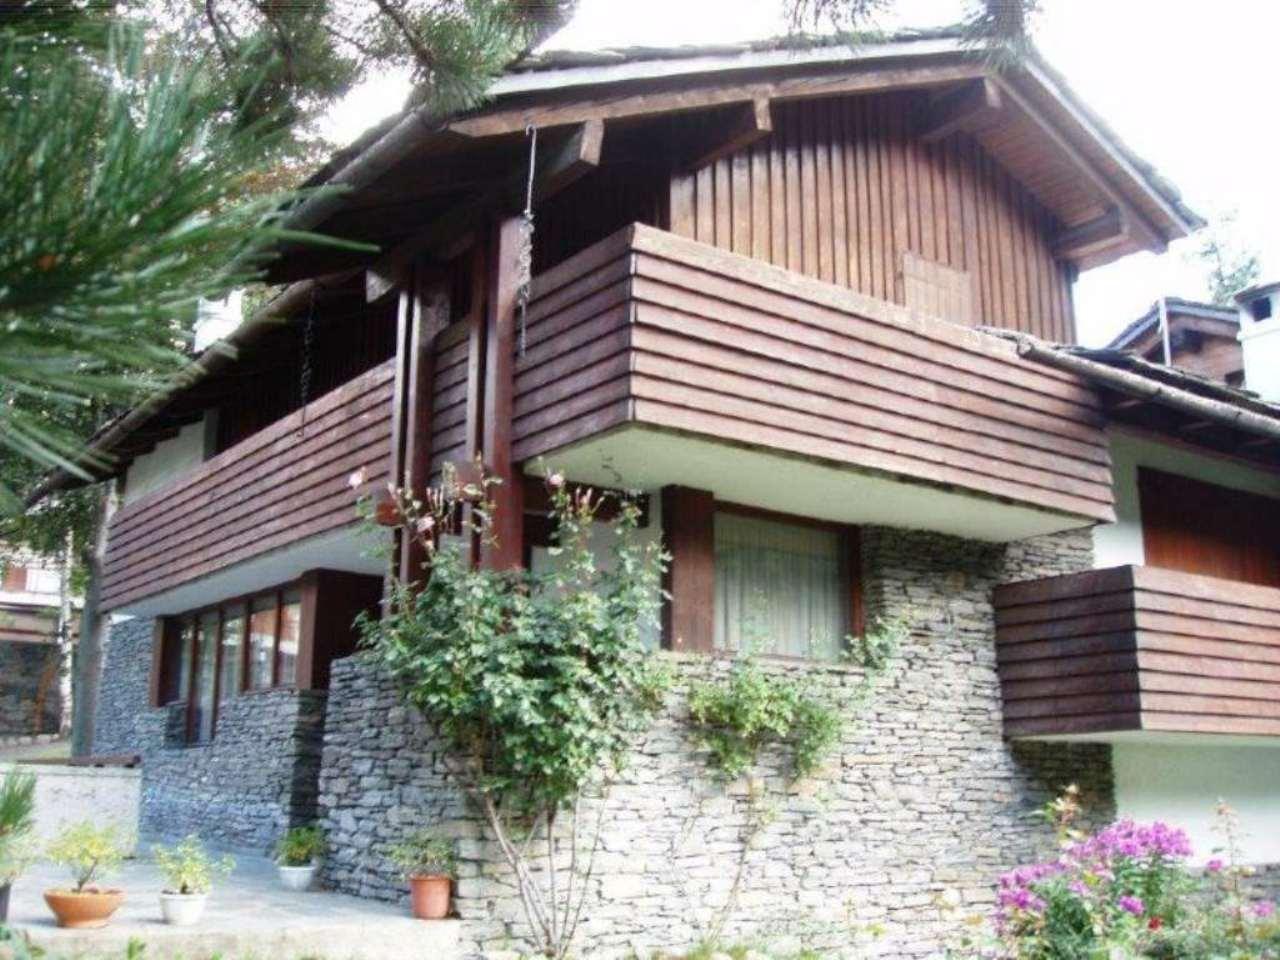 Villa in Vendita a Courmayeur: 5 locali, 450 mq - Foto 7